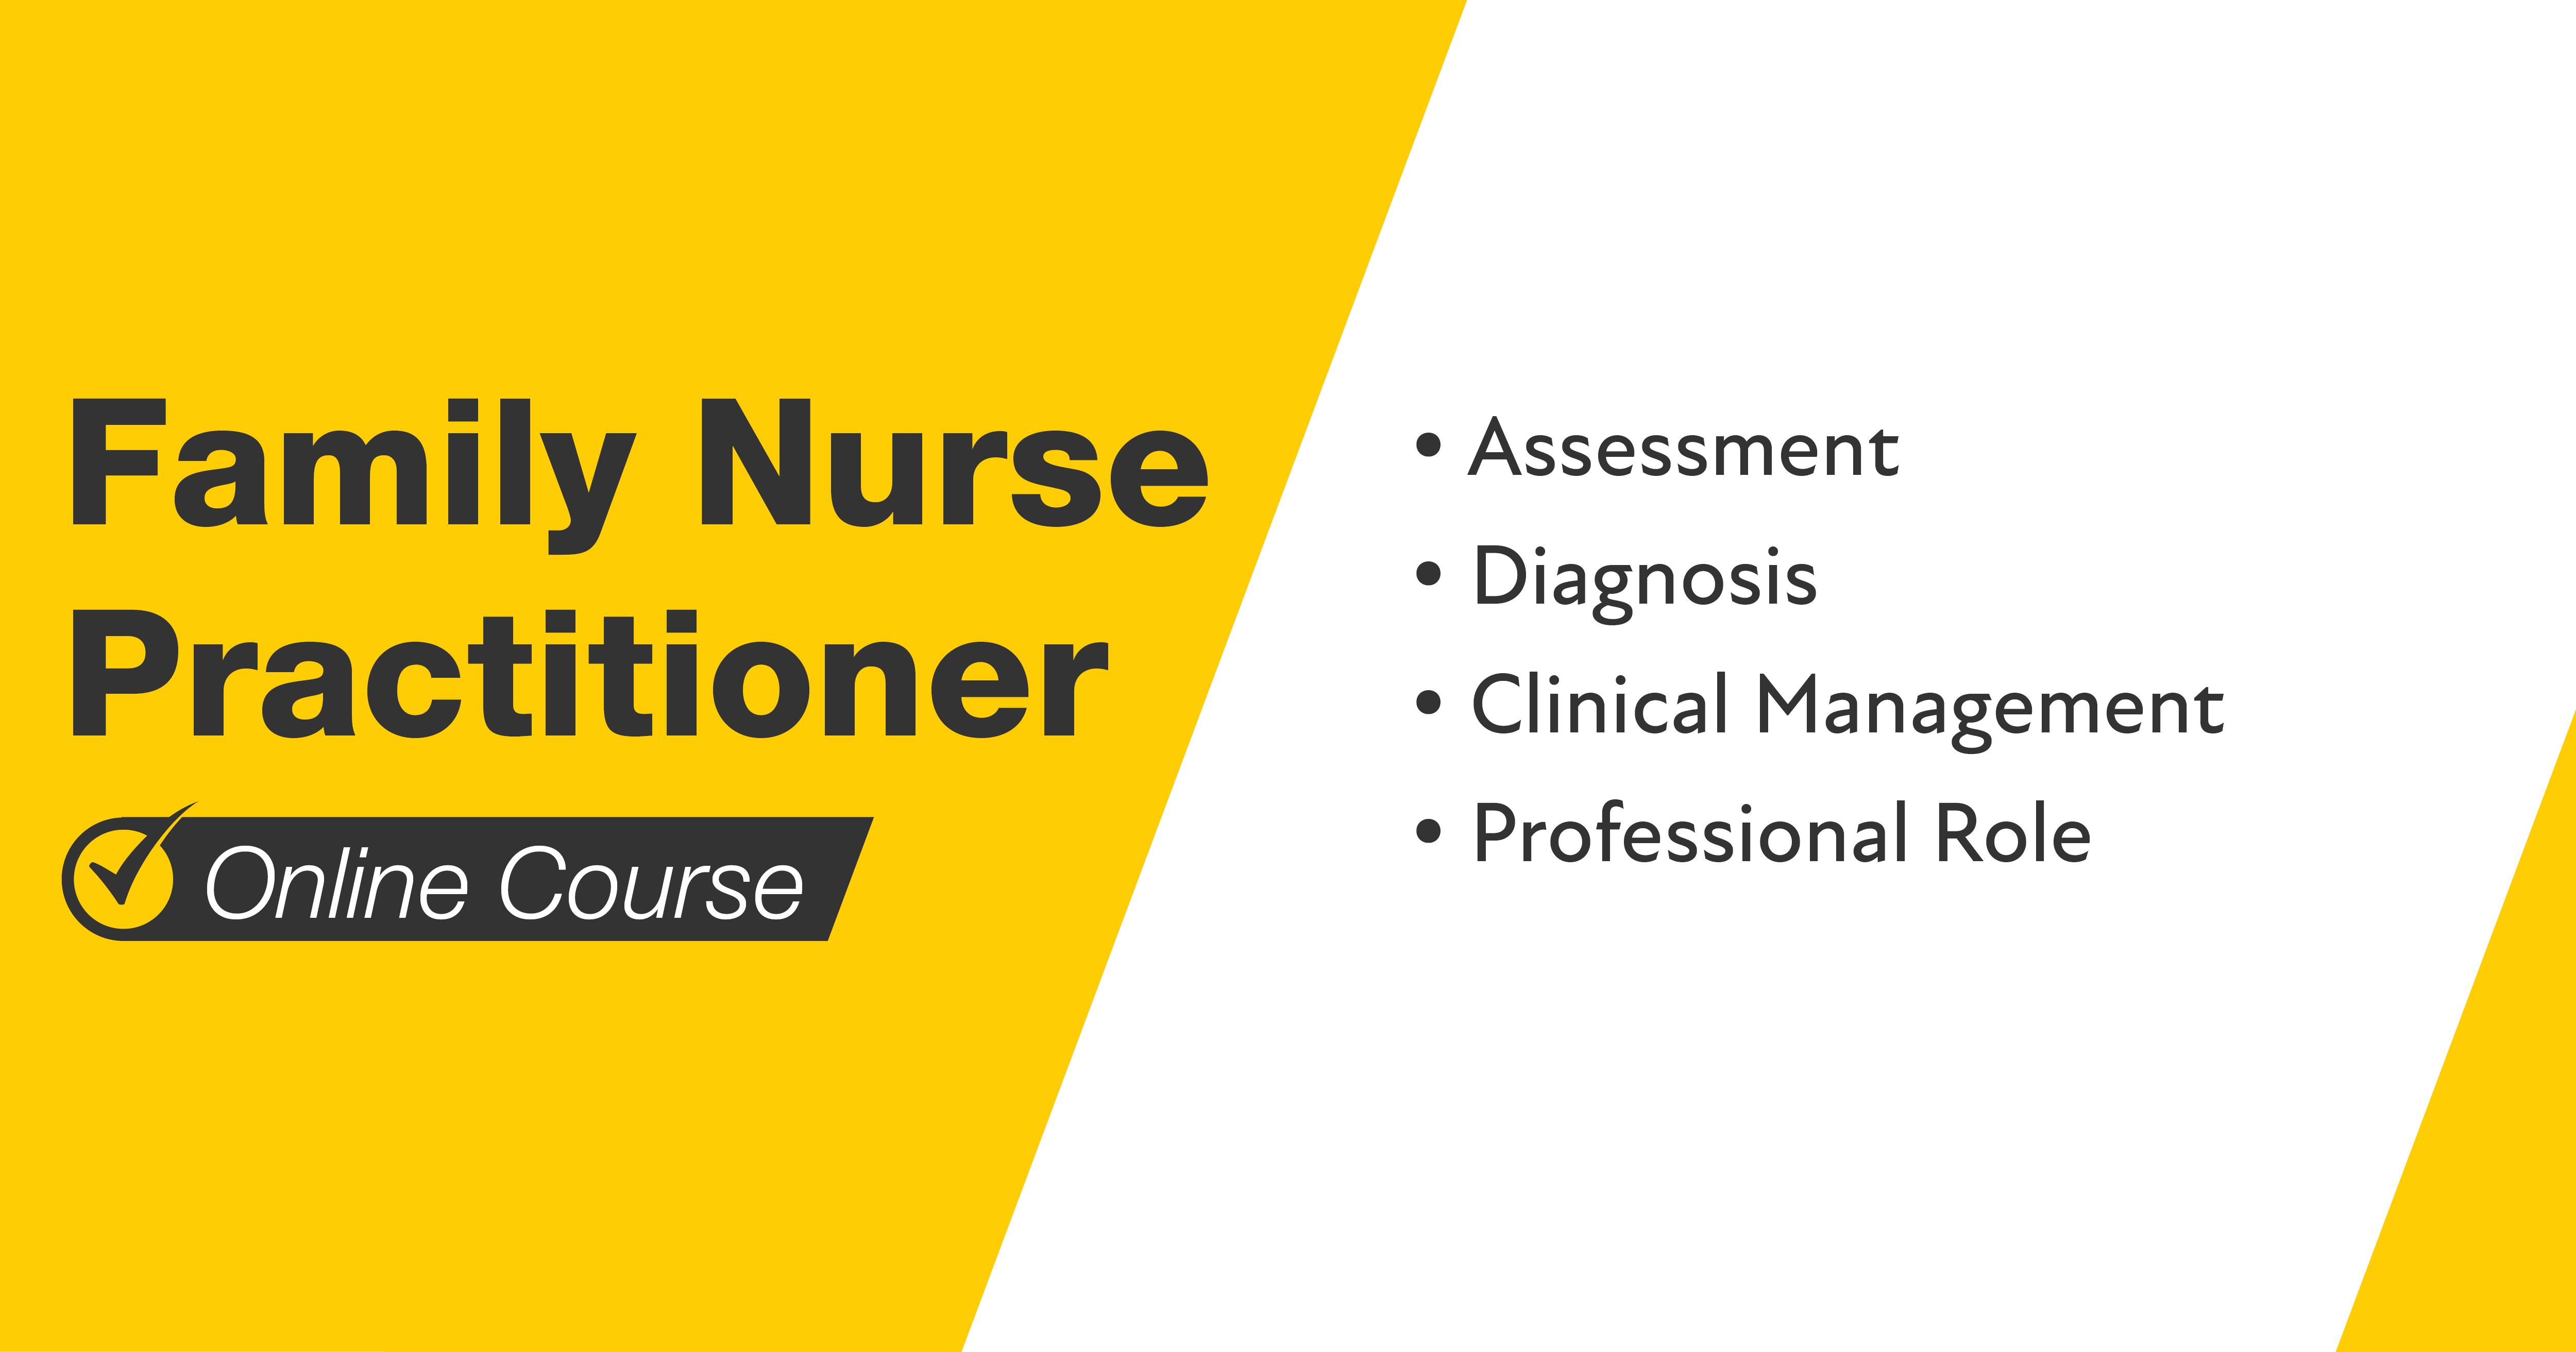 Mometrix Family Nurse Practitioner Course